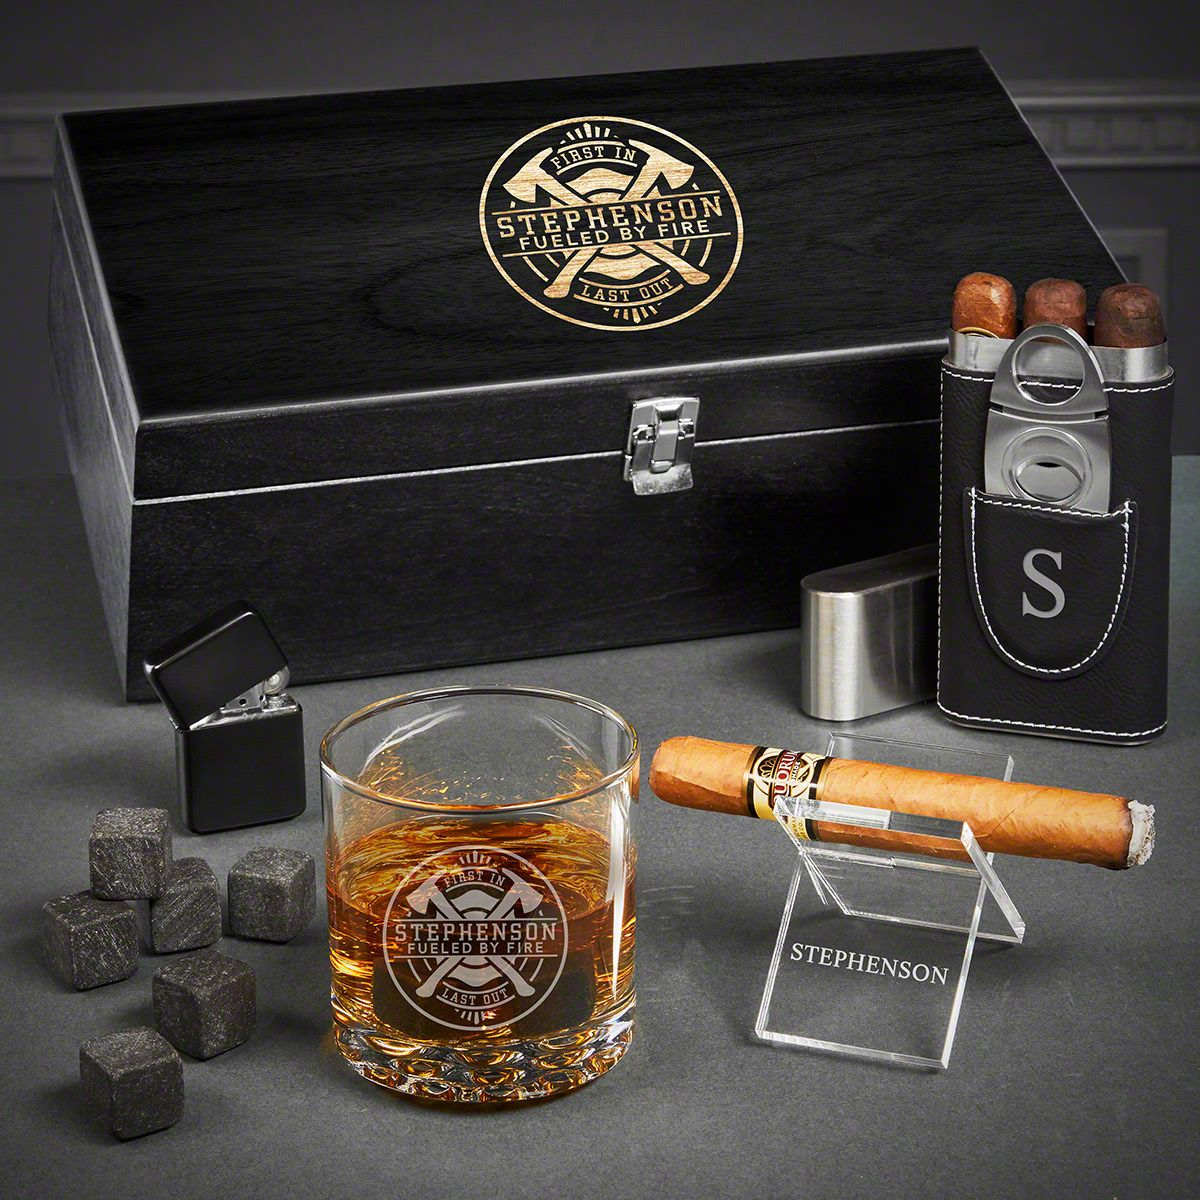 Firefighter Brotherhood Custom Whiskey Cigar Set of Firefighter Gift Ideas